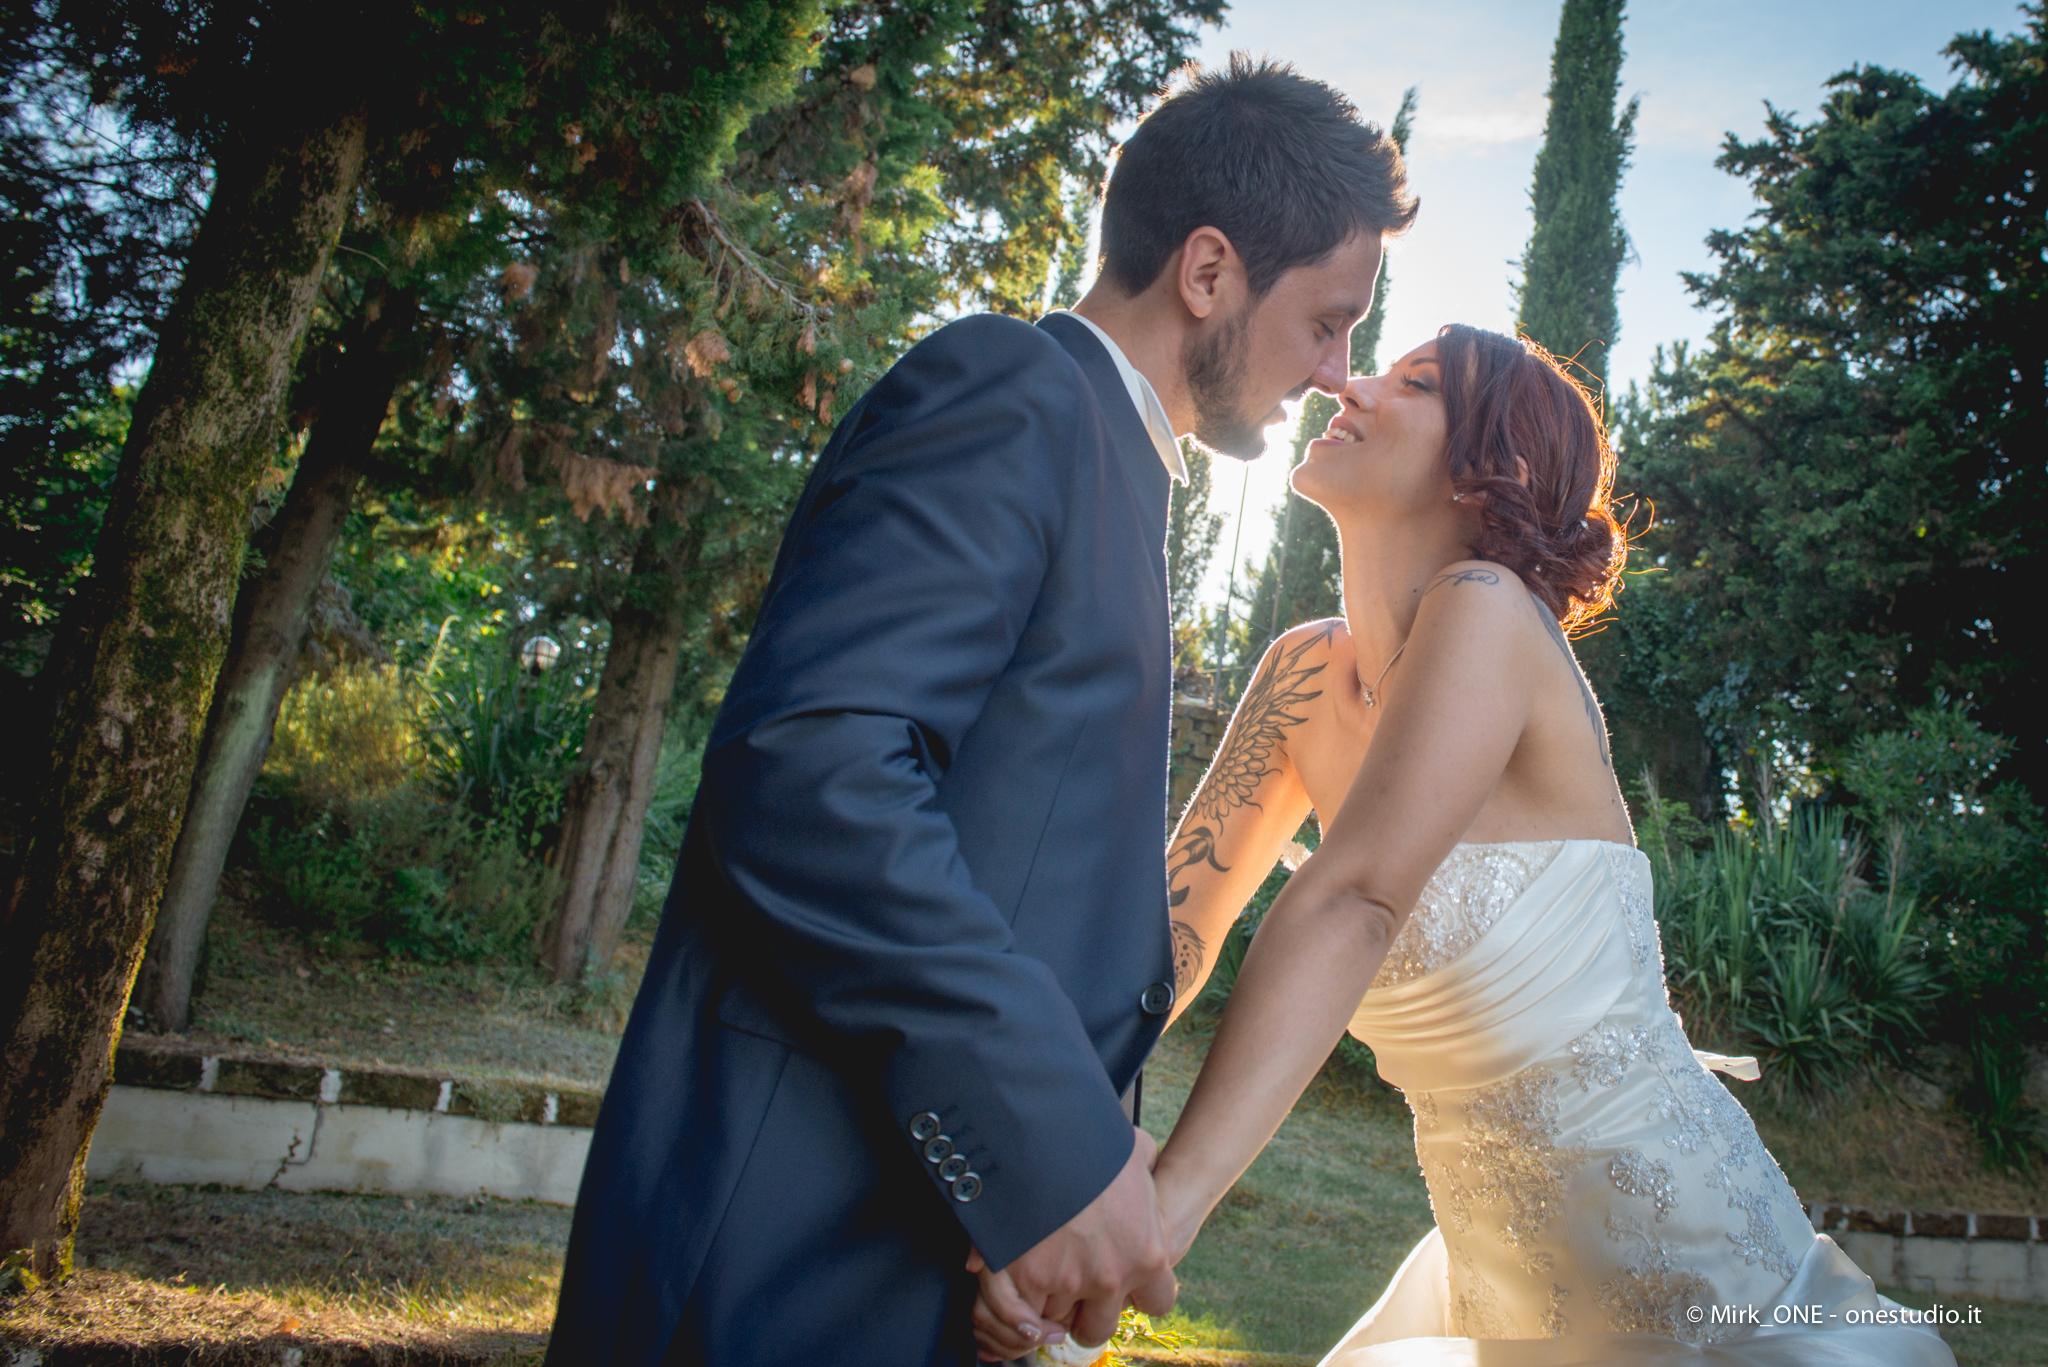 https://lnx.mirkone.it/wp-content/uploads/2015/07/mirk_ONE-fotografo-matrimonio-00815.jpg